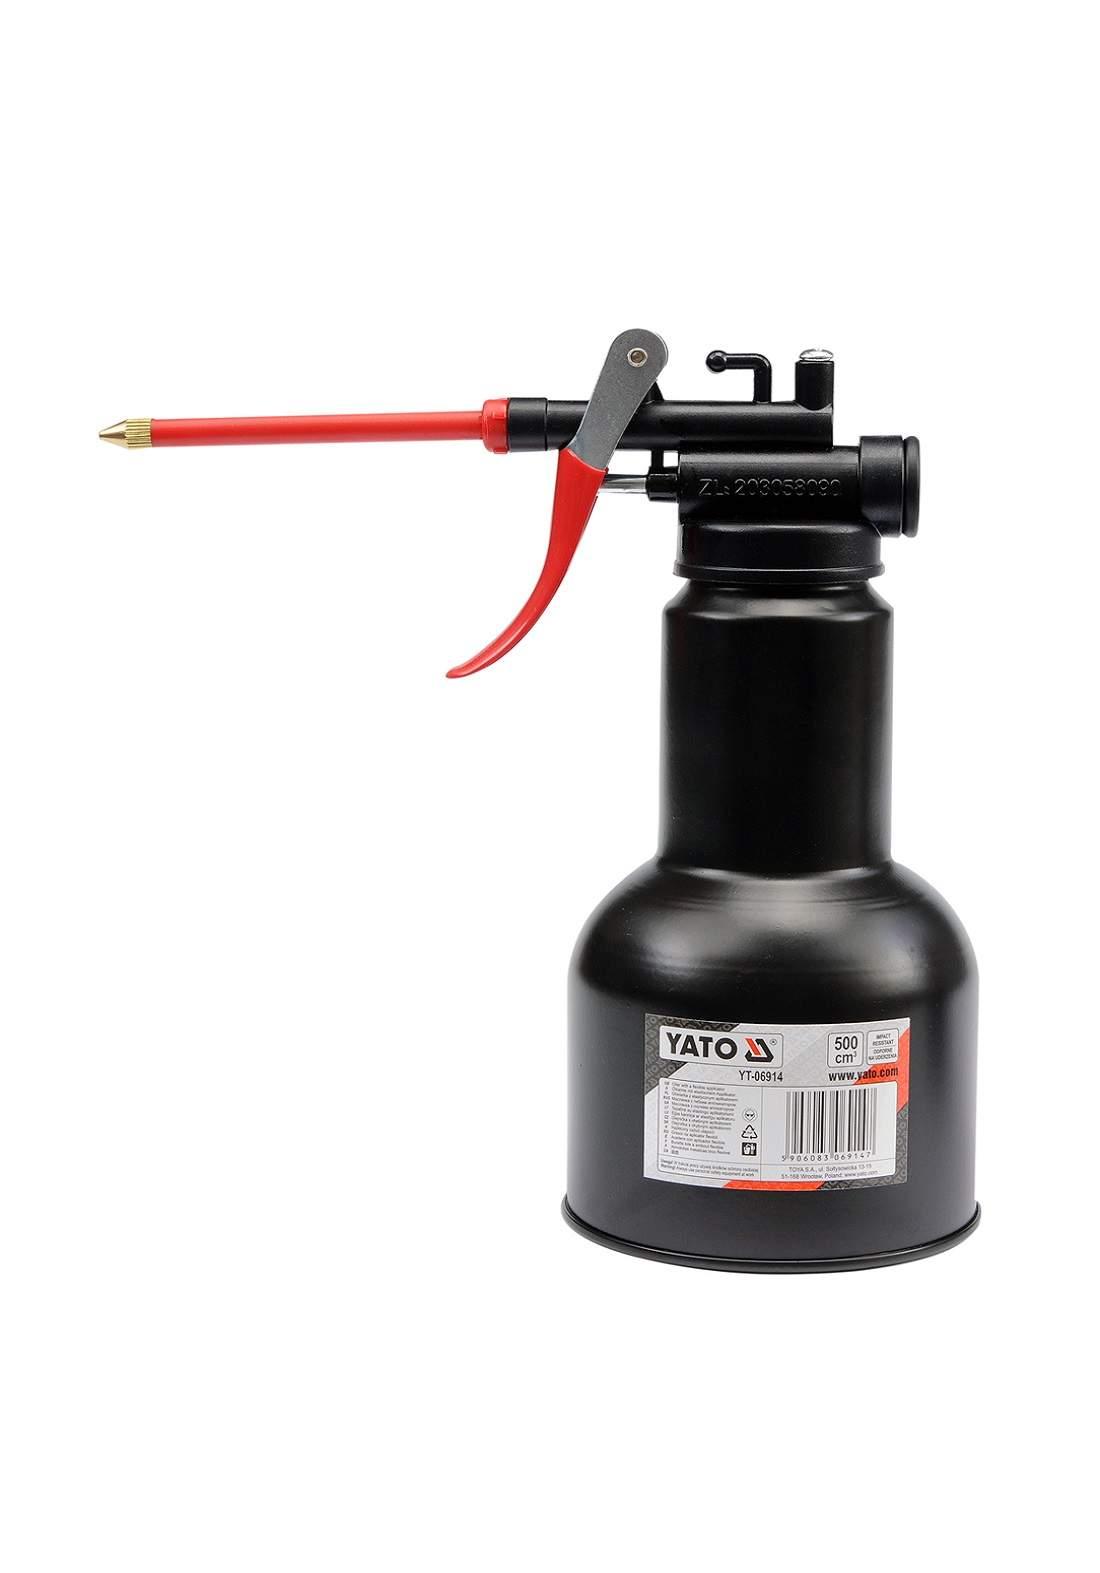 Yato YT-06914 Oiler Tool 500 ml اداة التزييت